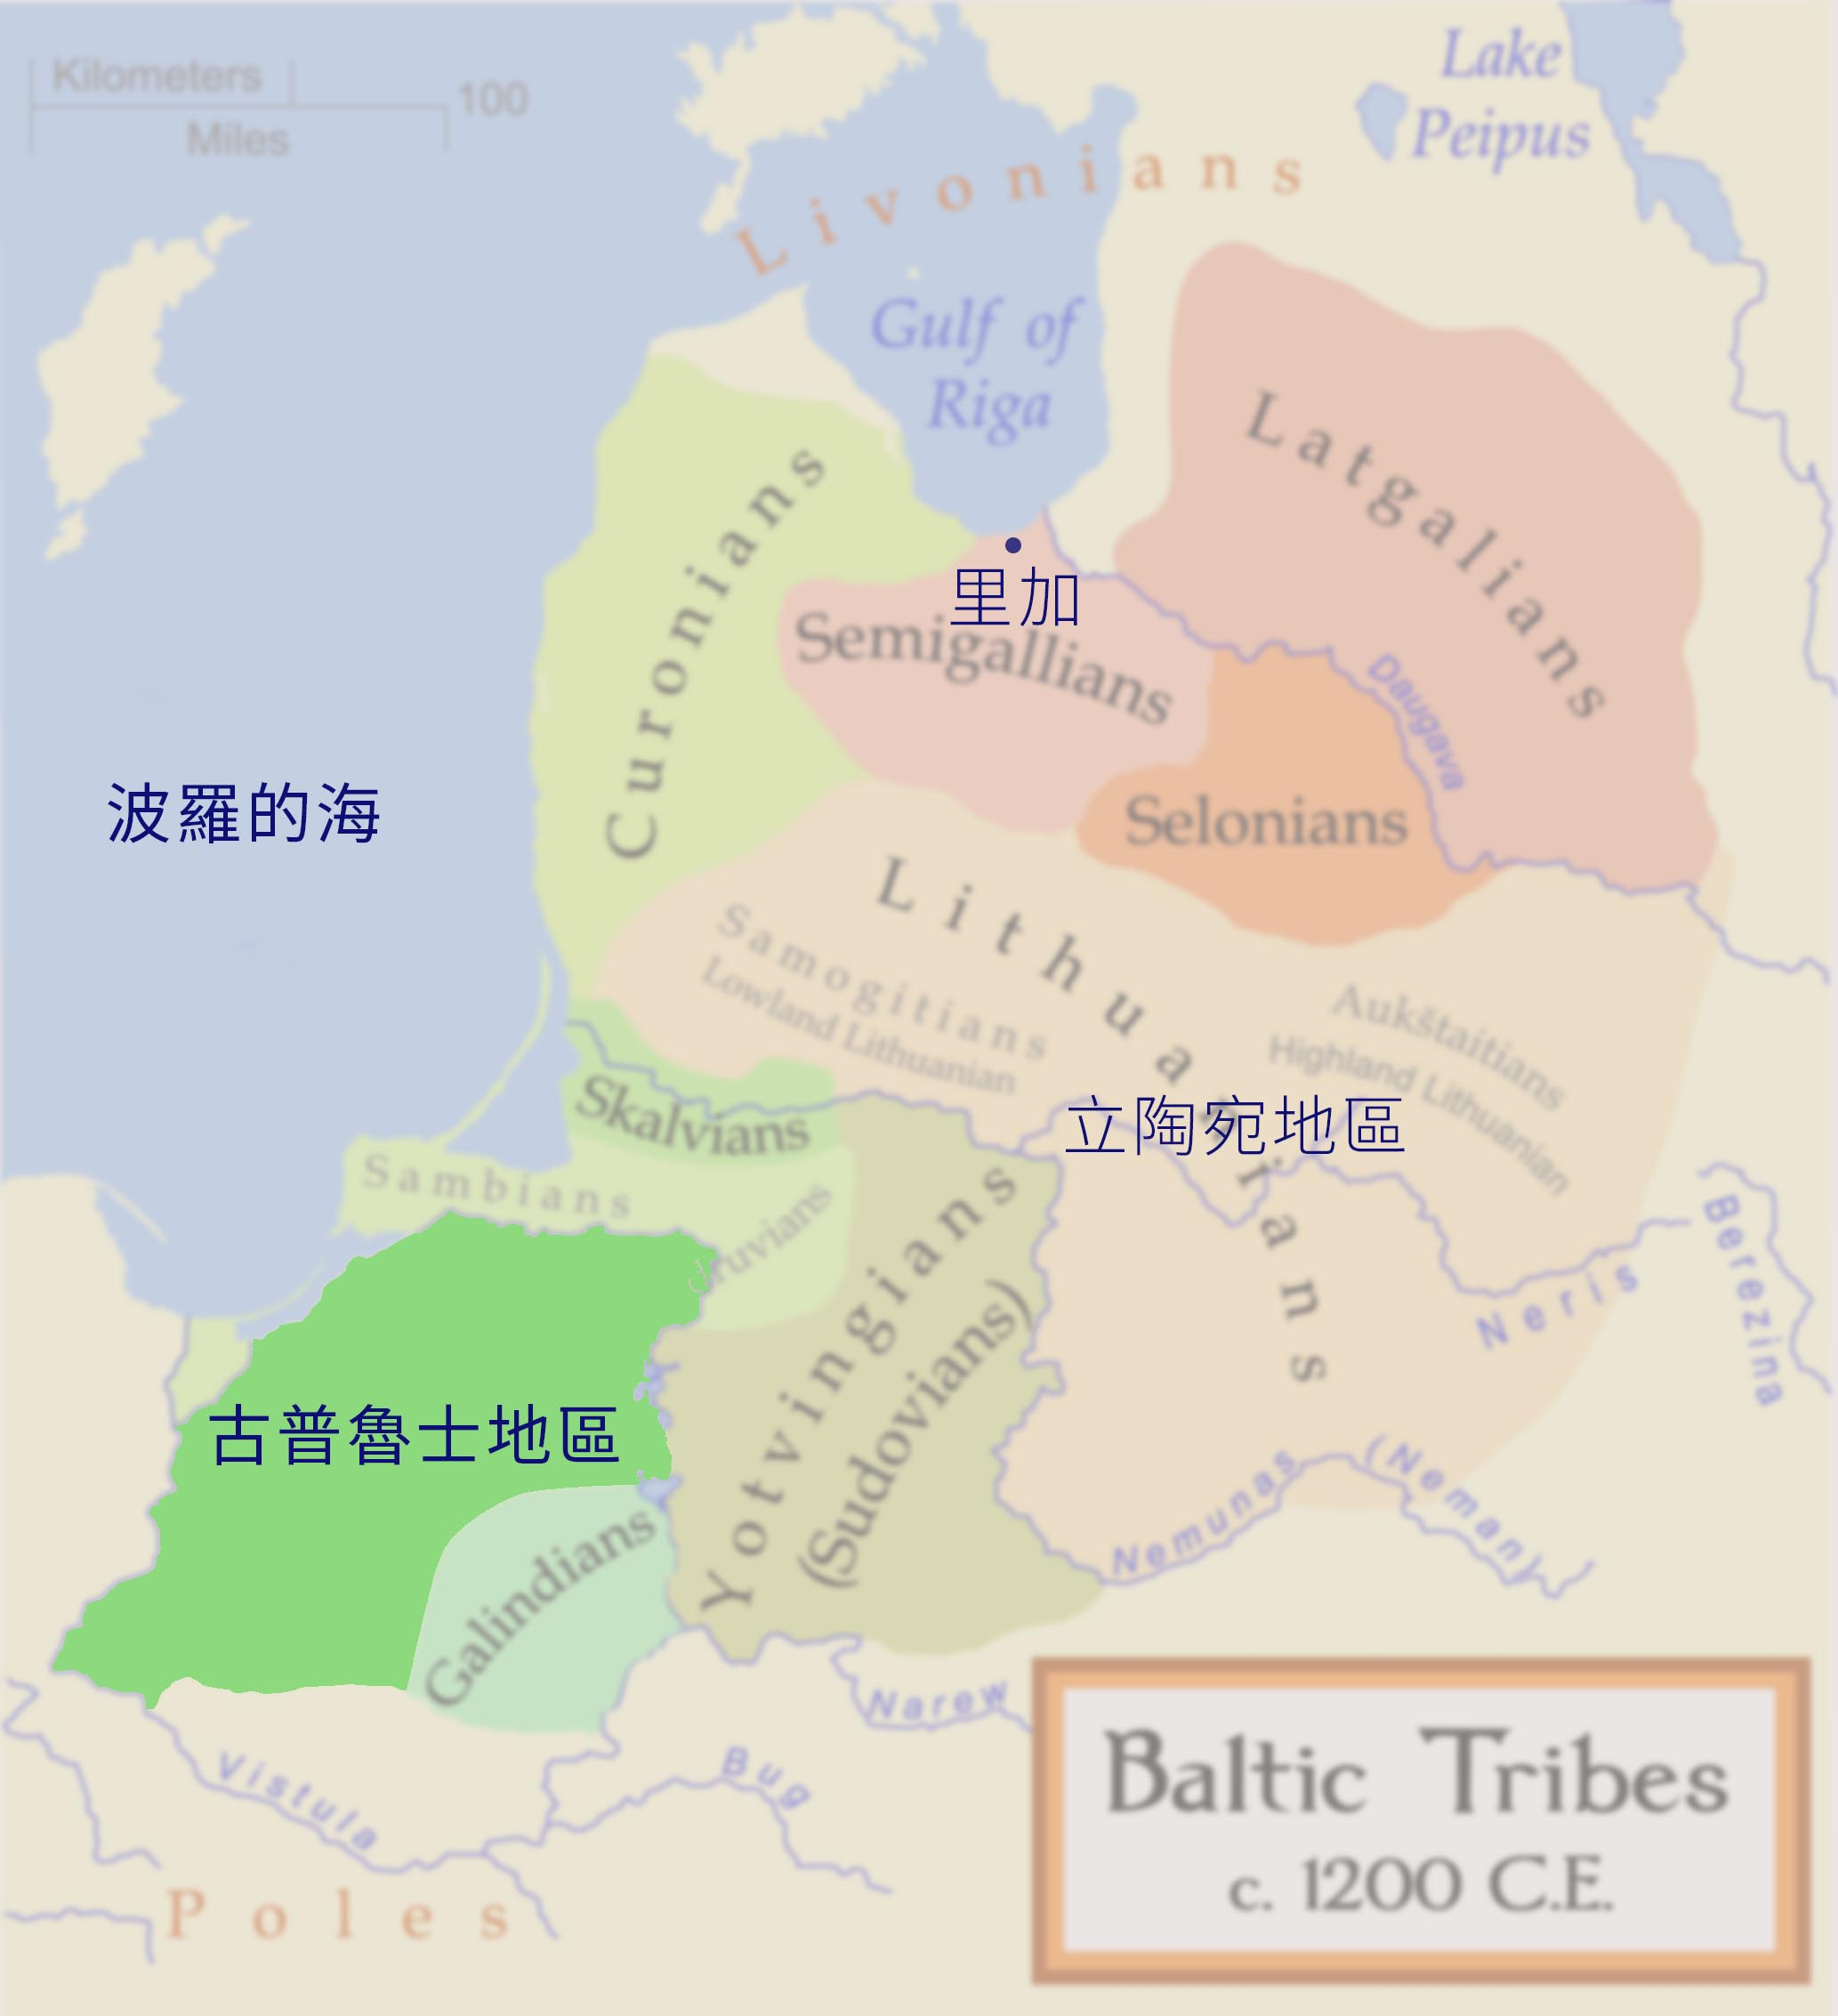 普魯士 Prussia